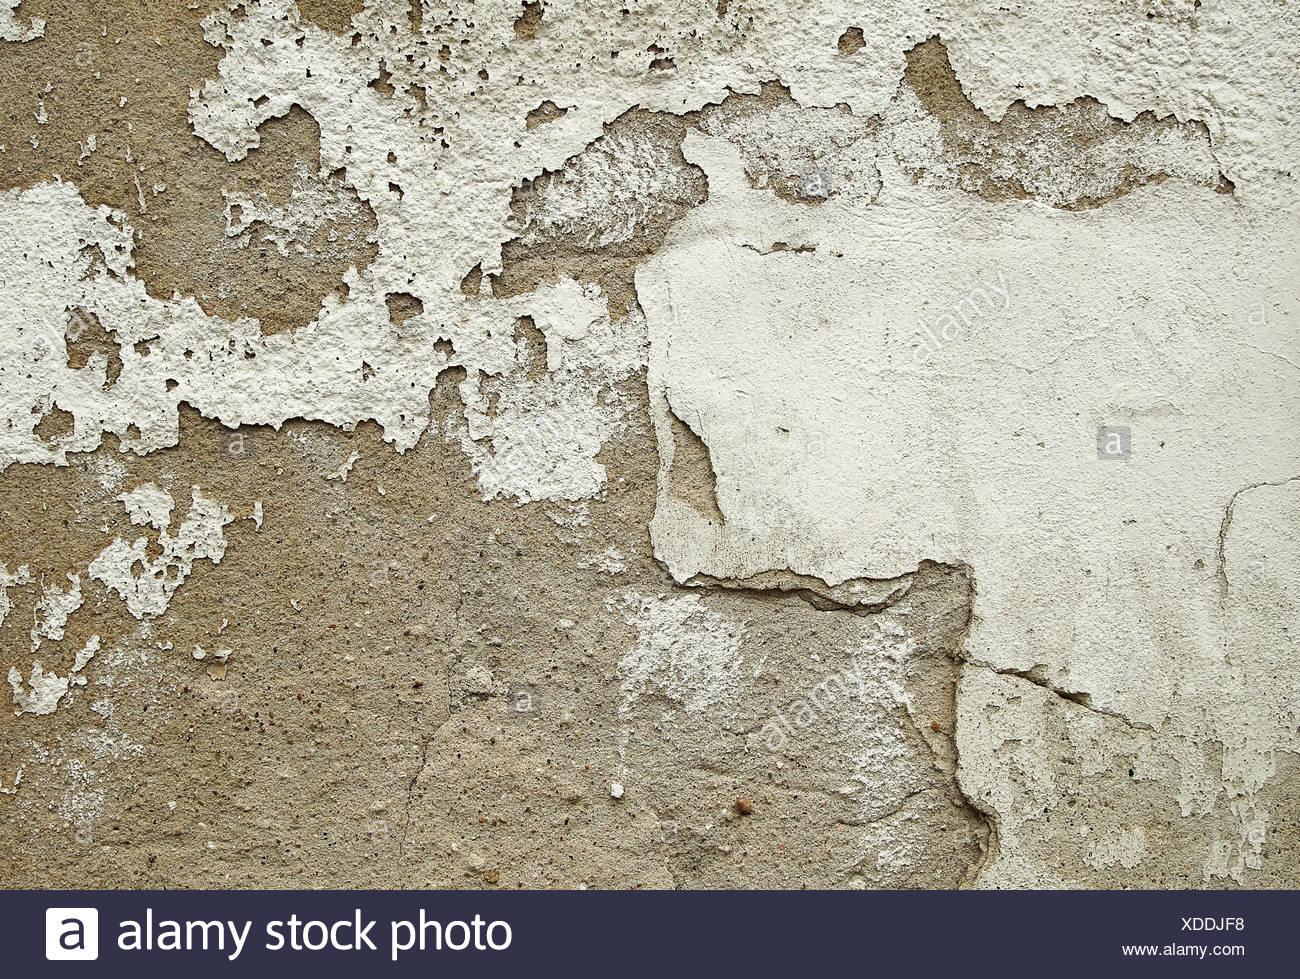 wandputz / wall plaster stock photo: 283656332 - alamy